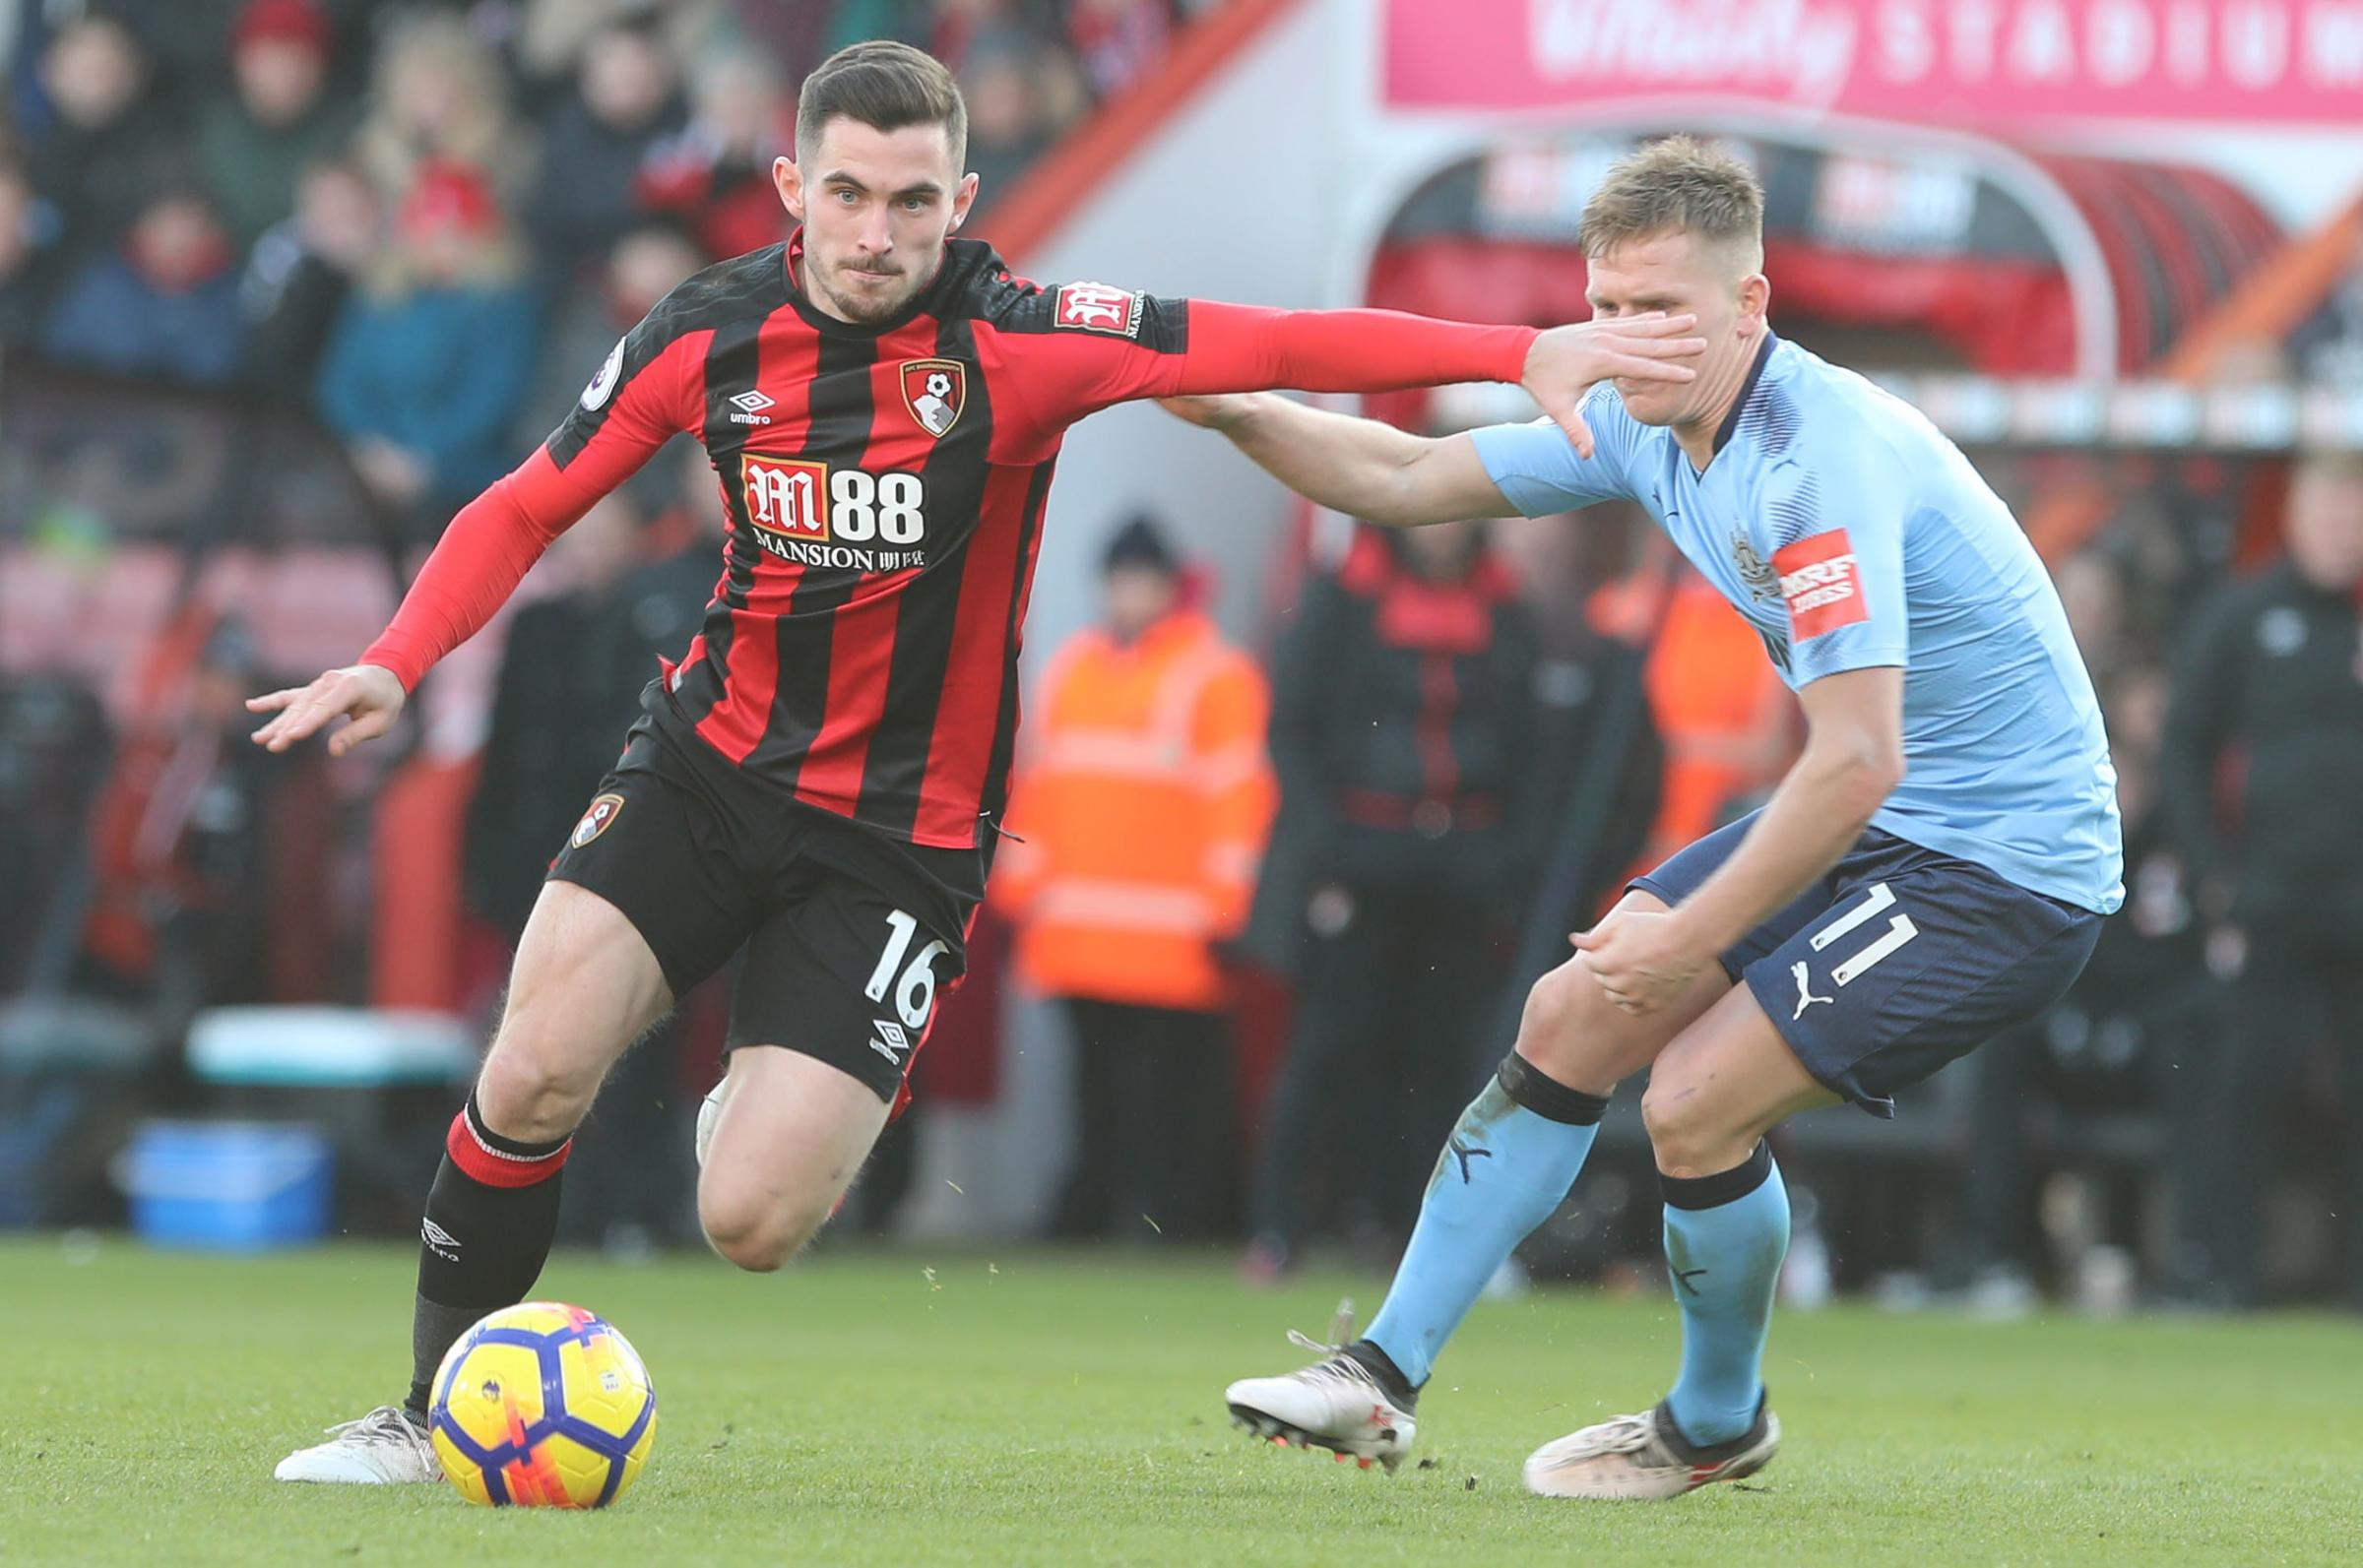 AFC Bournemouth captain Simon Francis heaps praise on 'inspirational' Lewis Cook